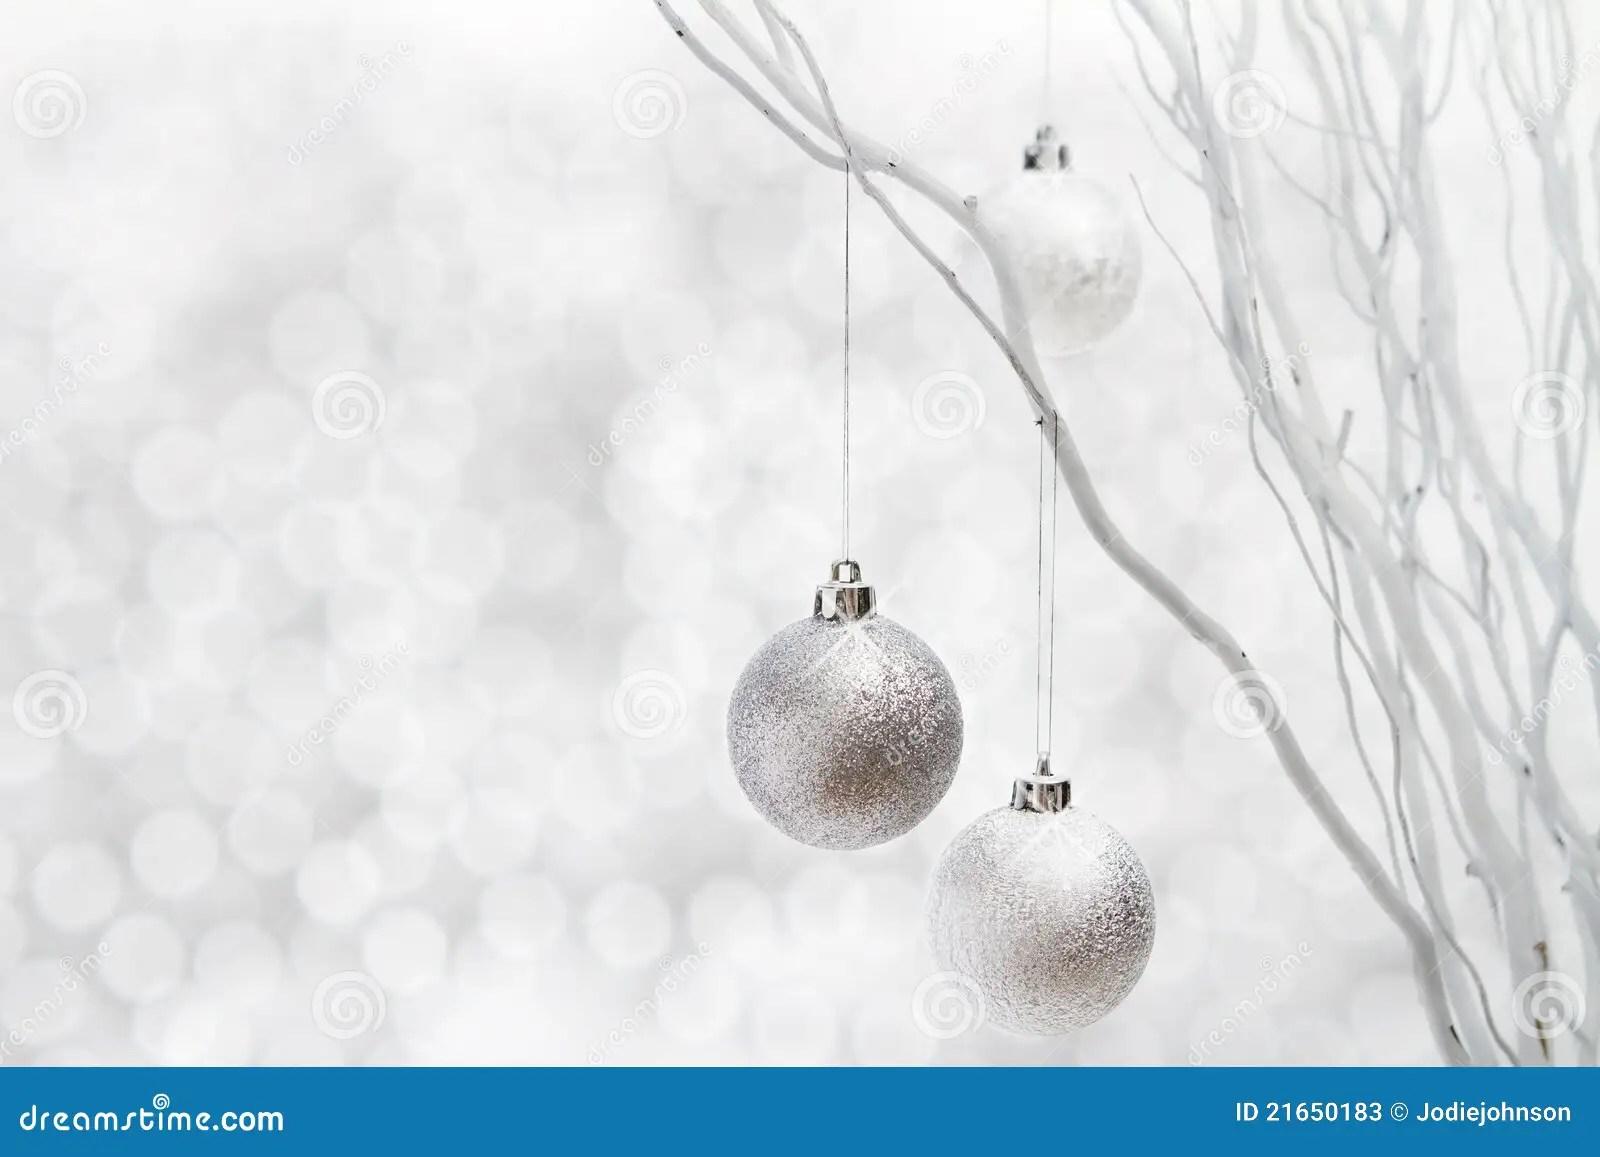 Wallpaper Hd Portrait Orientation White Christmas Background Silver Balls Stock Image